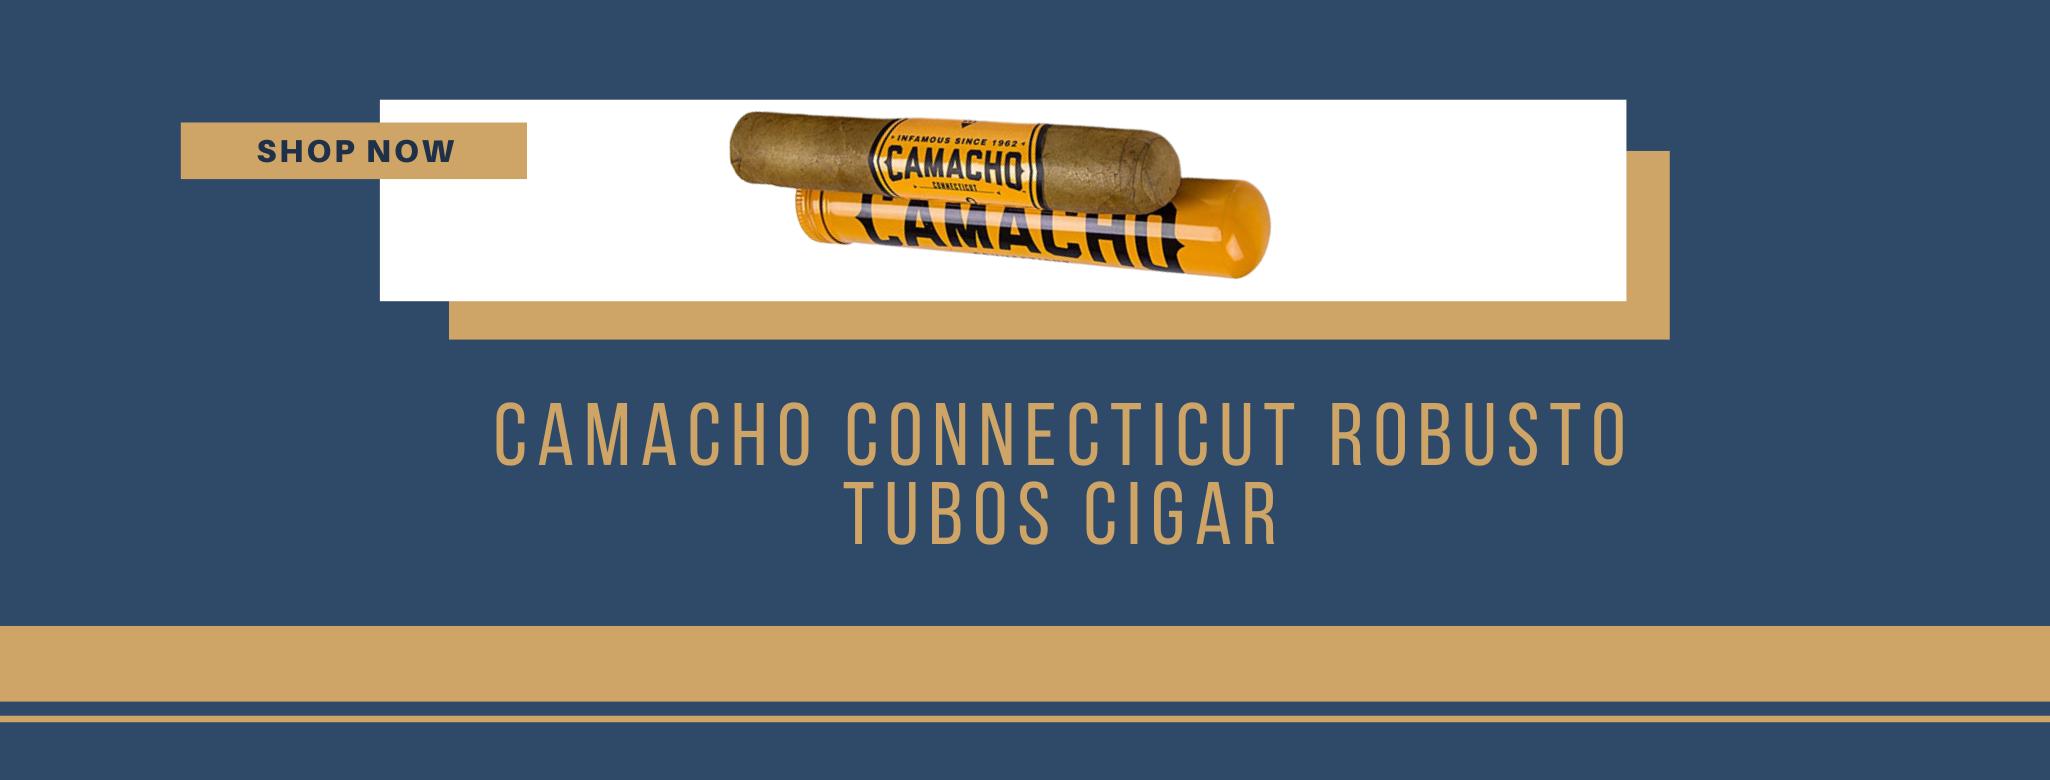 Buy Camacho Connecticut Robusto Tubos cigars online